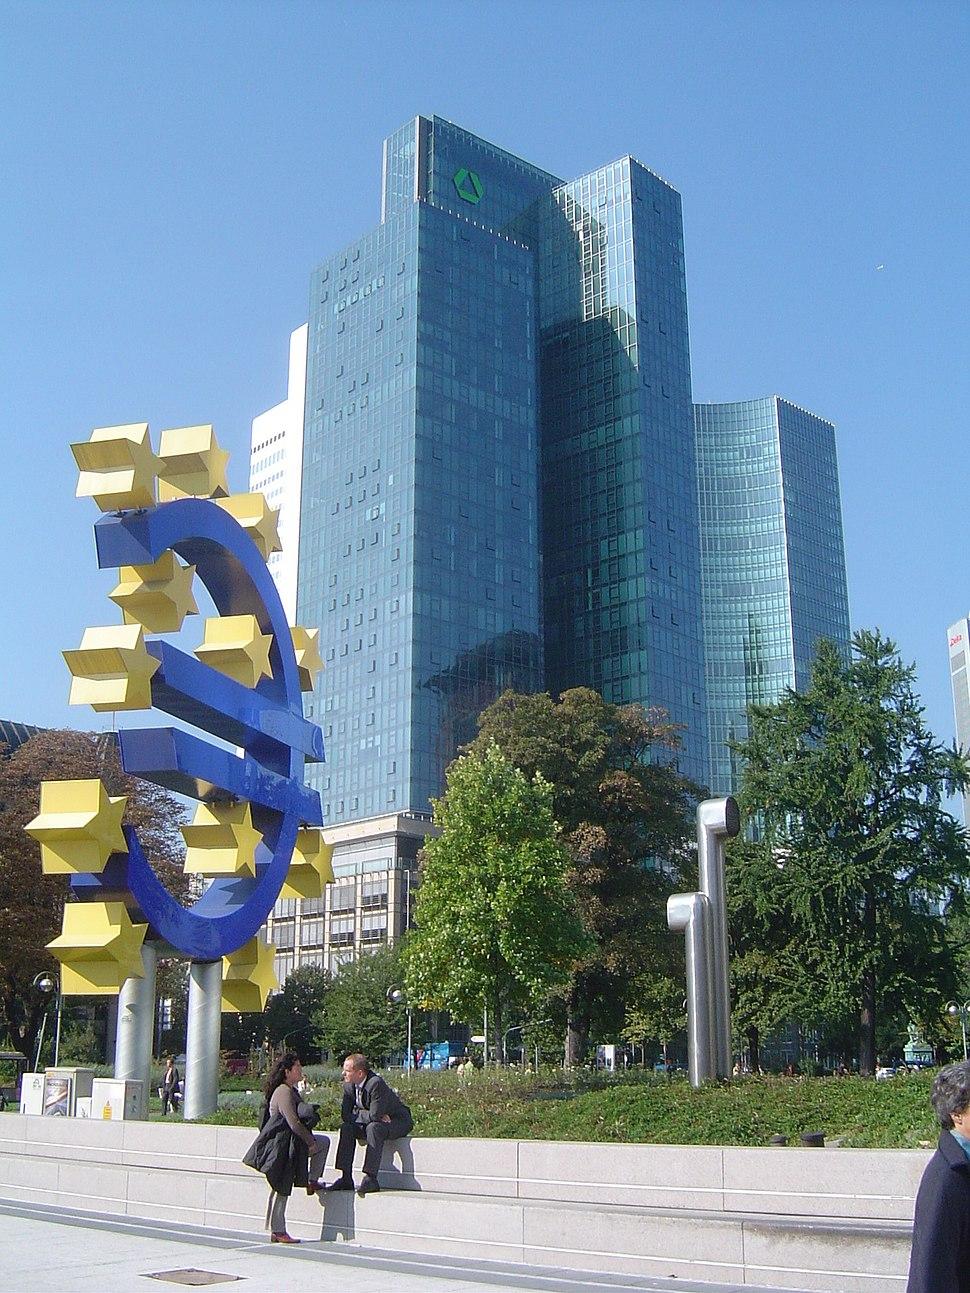 Image-Dresdner Bank and Euro, Frankfurt